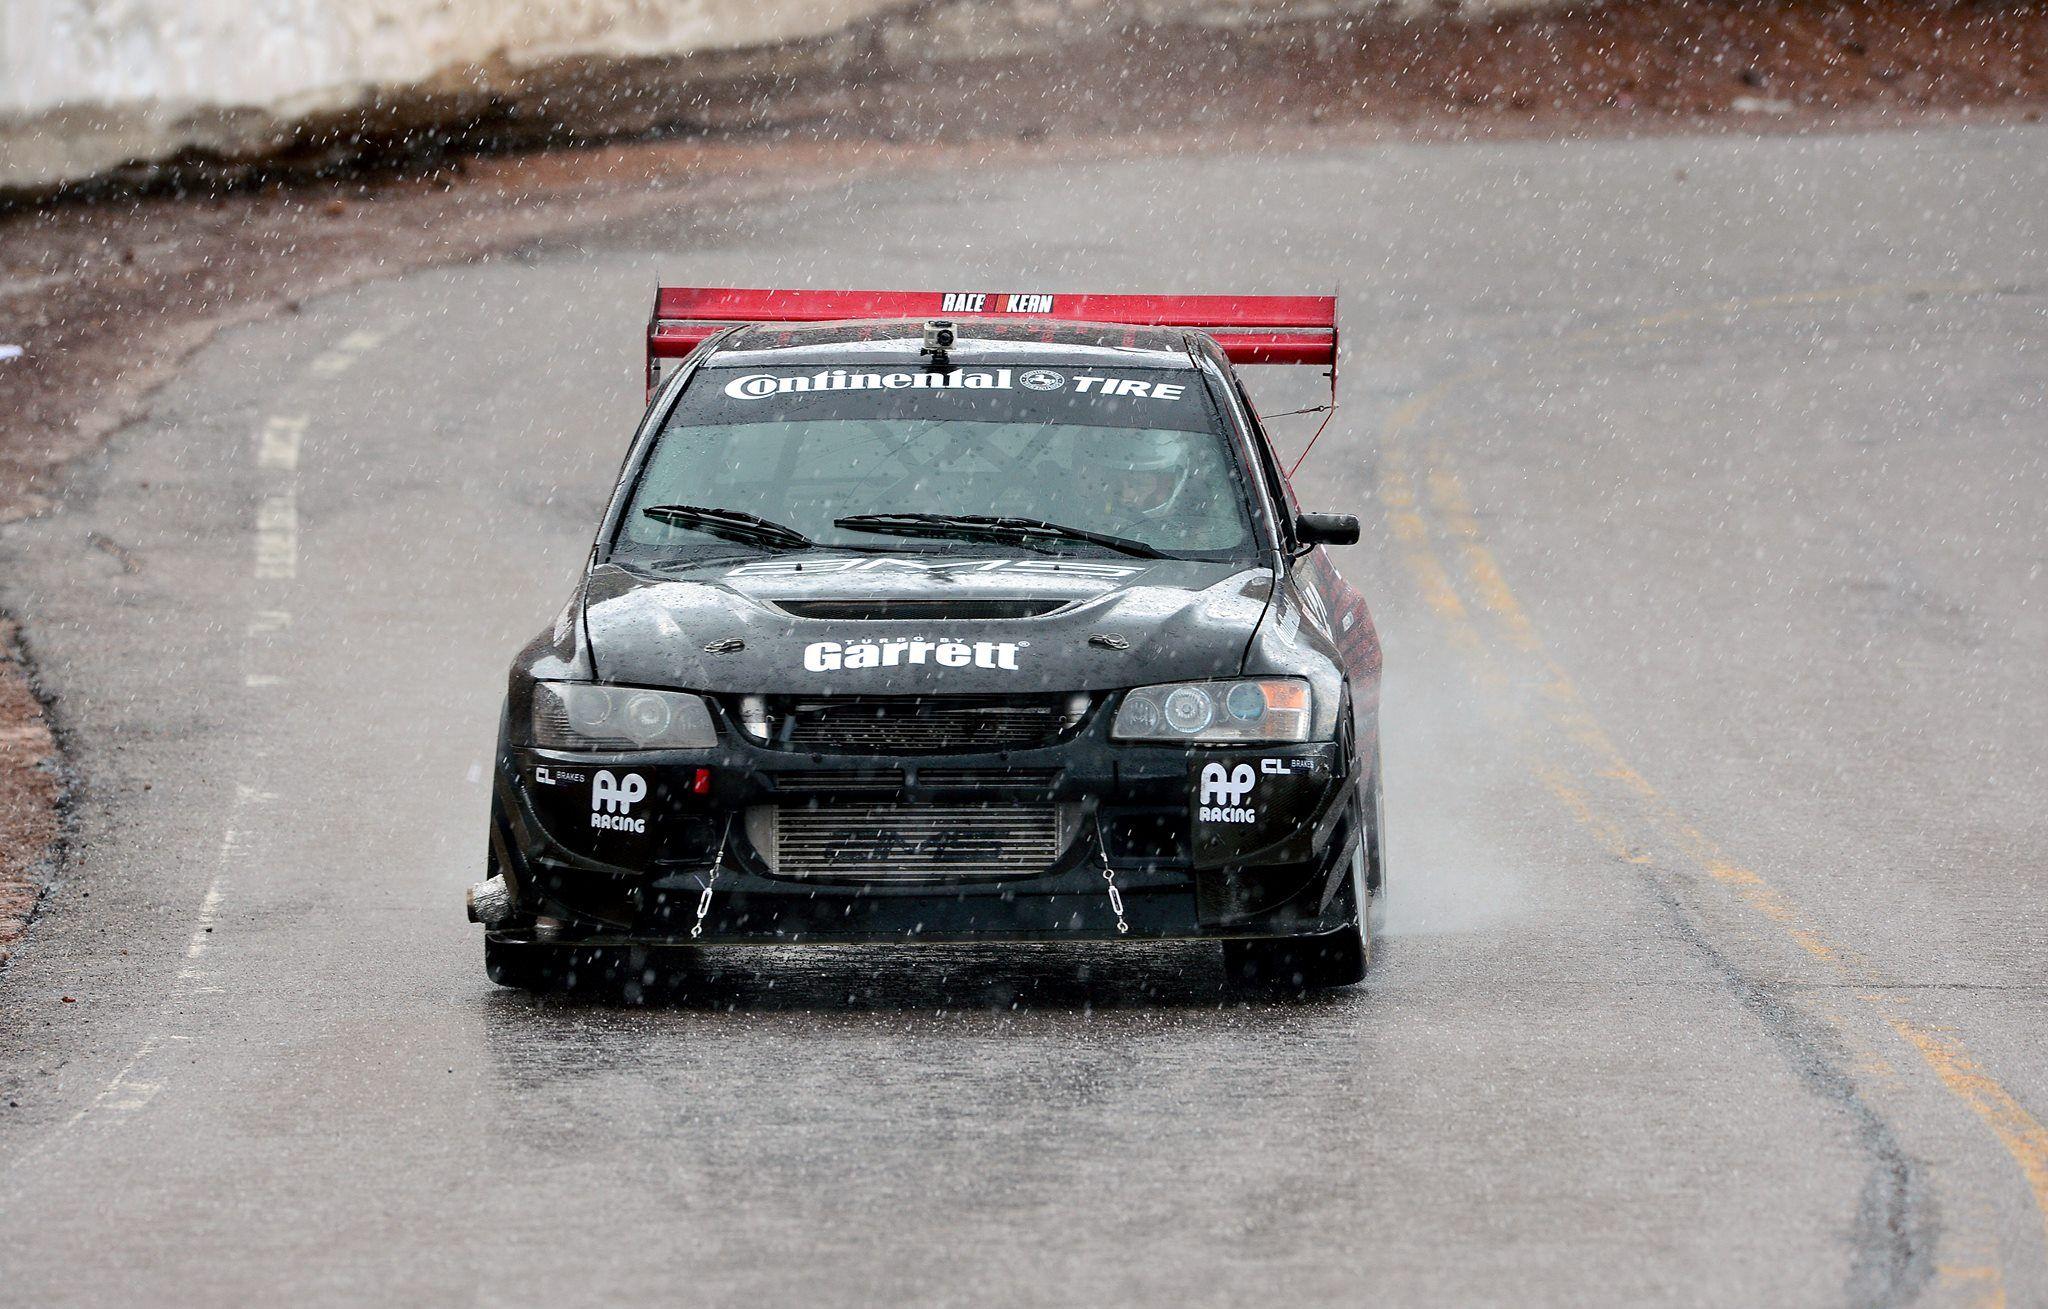 Mitsubishi Lancer Evo IX Time Attack Car